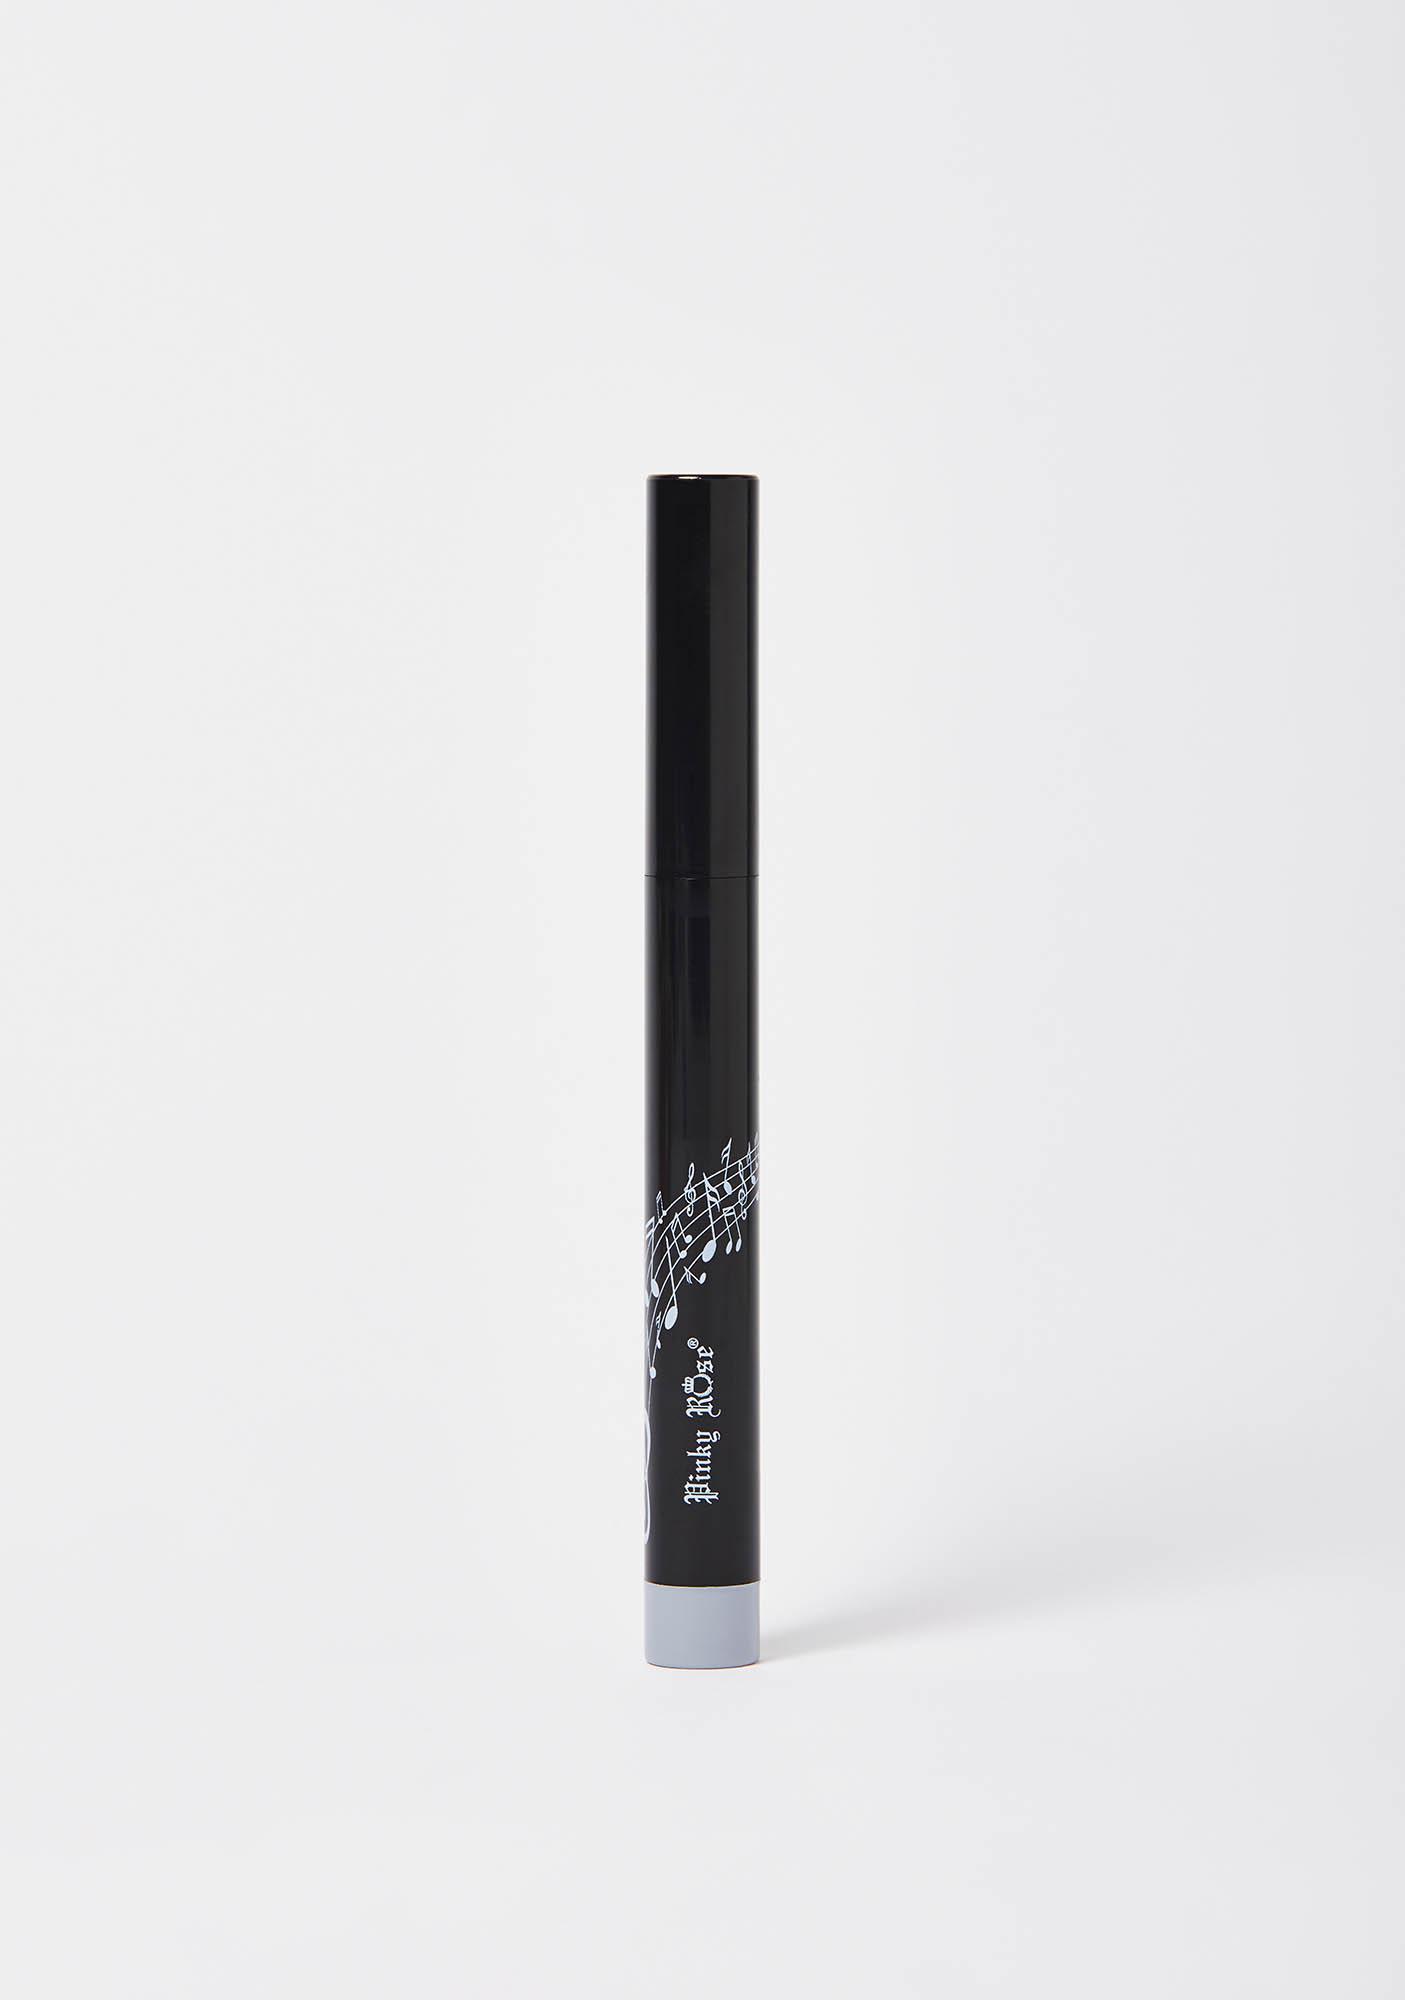 Pinky Rose Cosmetics Silver Heavy Metal Base Stick